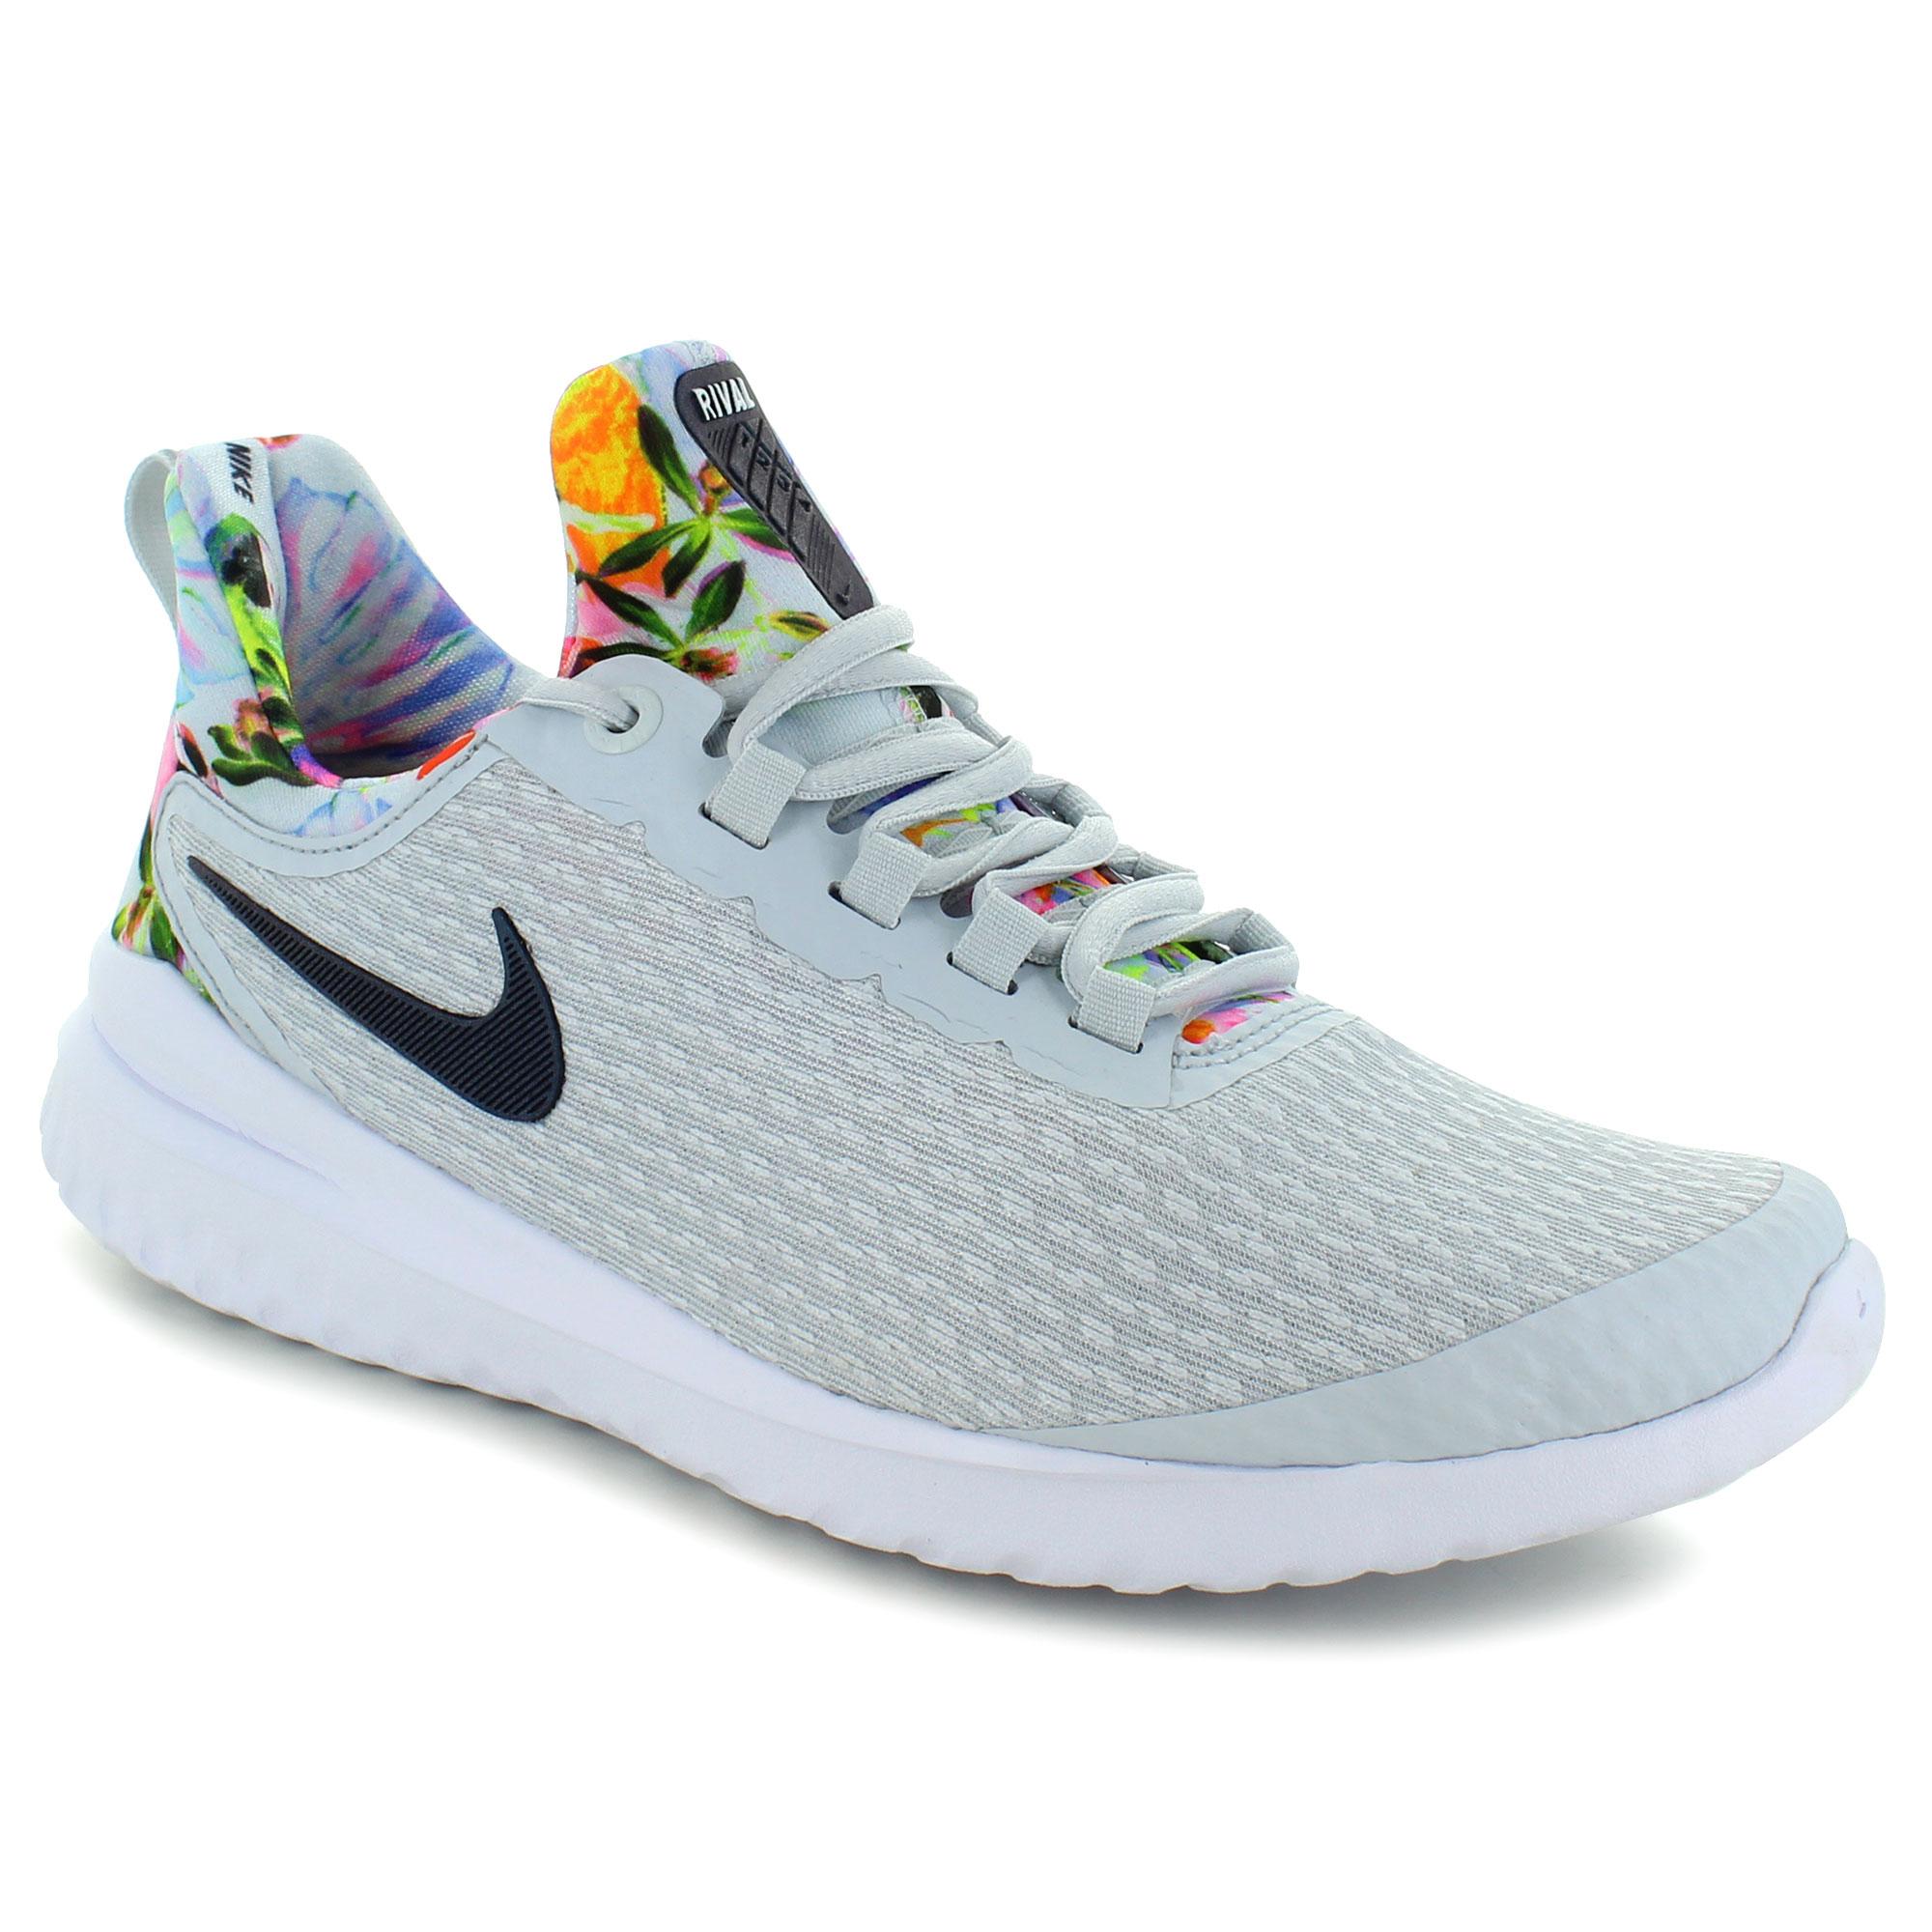 Nike Renew Rival Premium   SHOE DEPT ENCORE